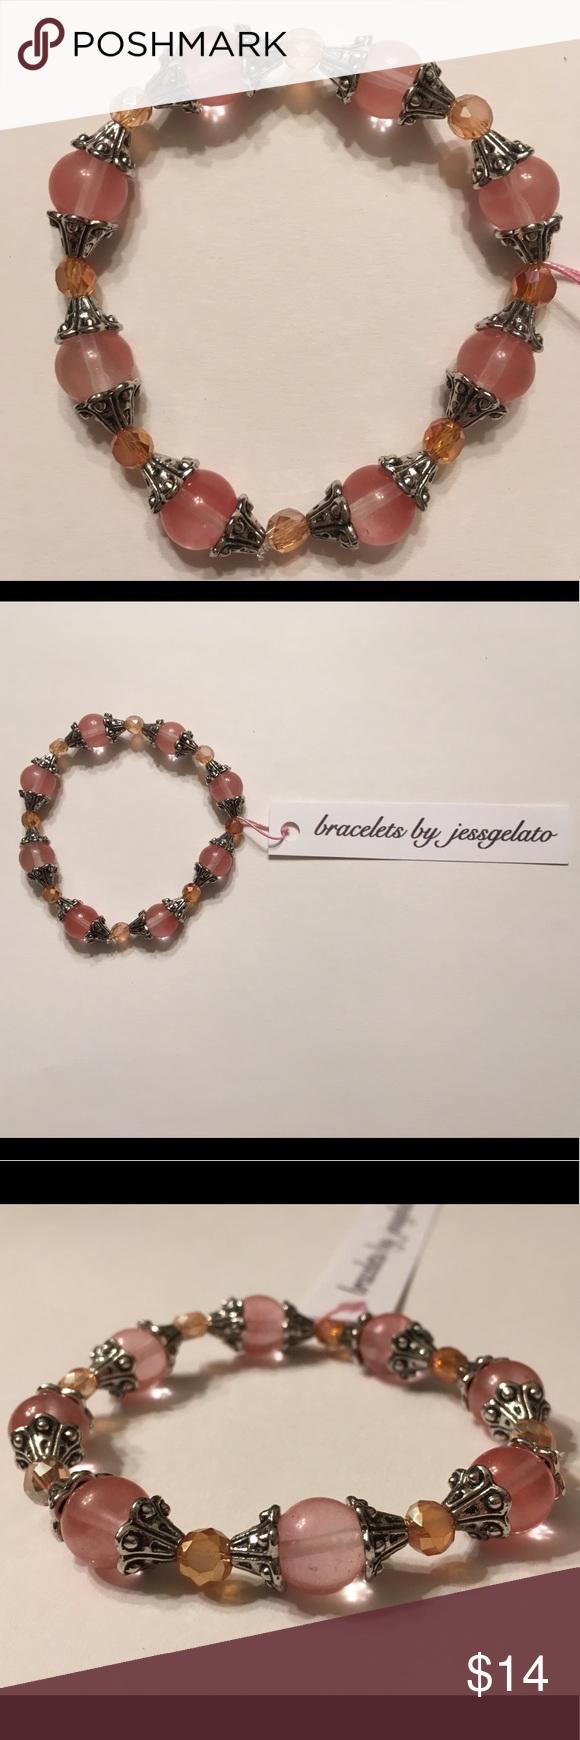 Handmade salmon colored beaded bracelet NWT Beaded